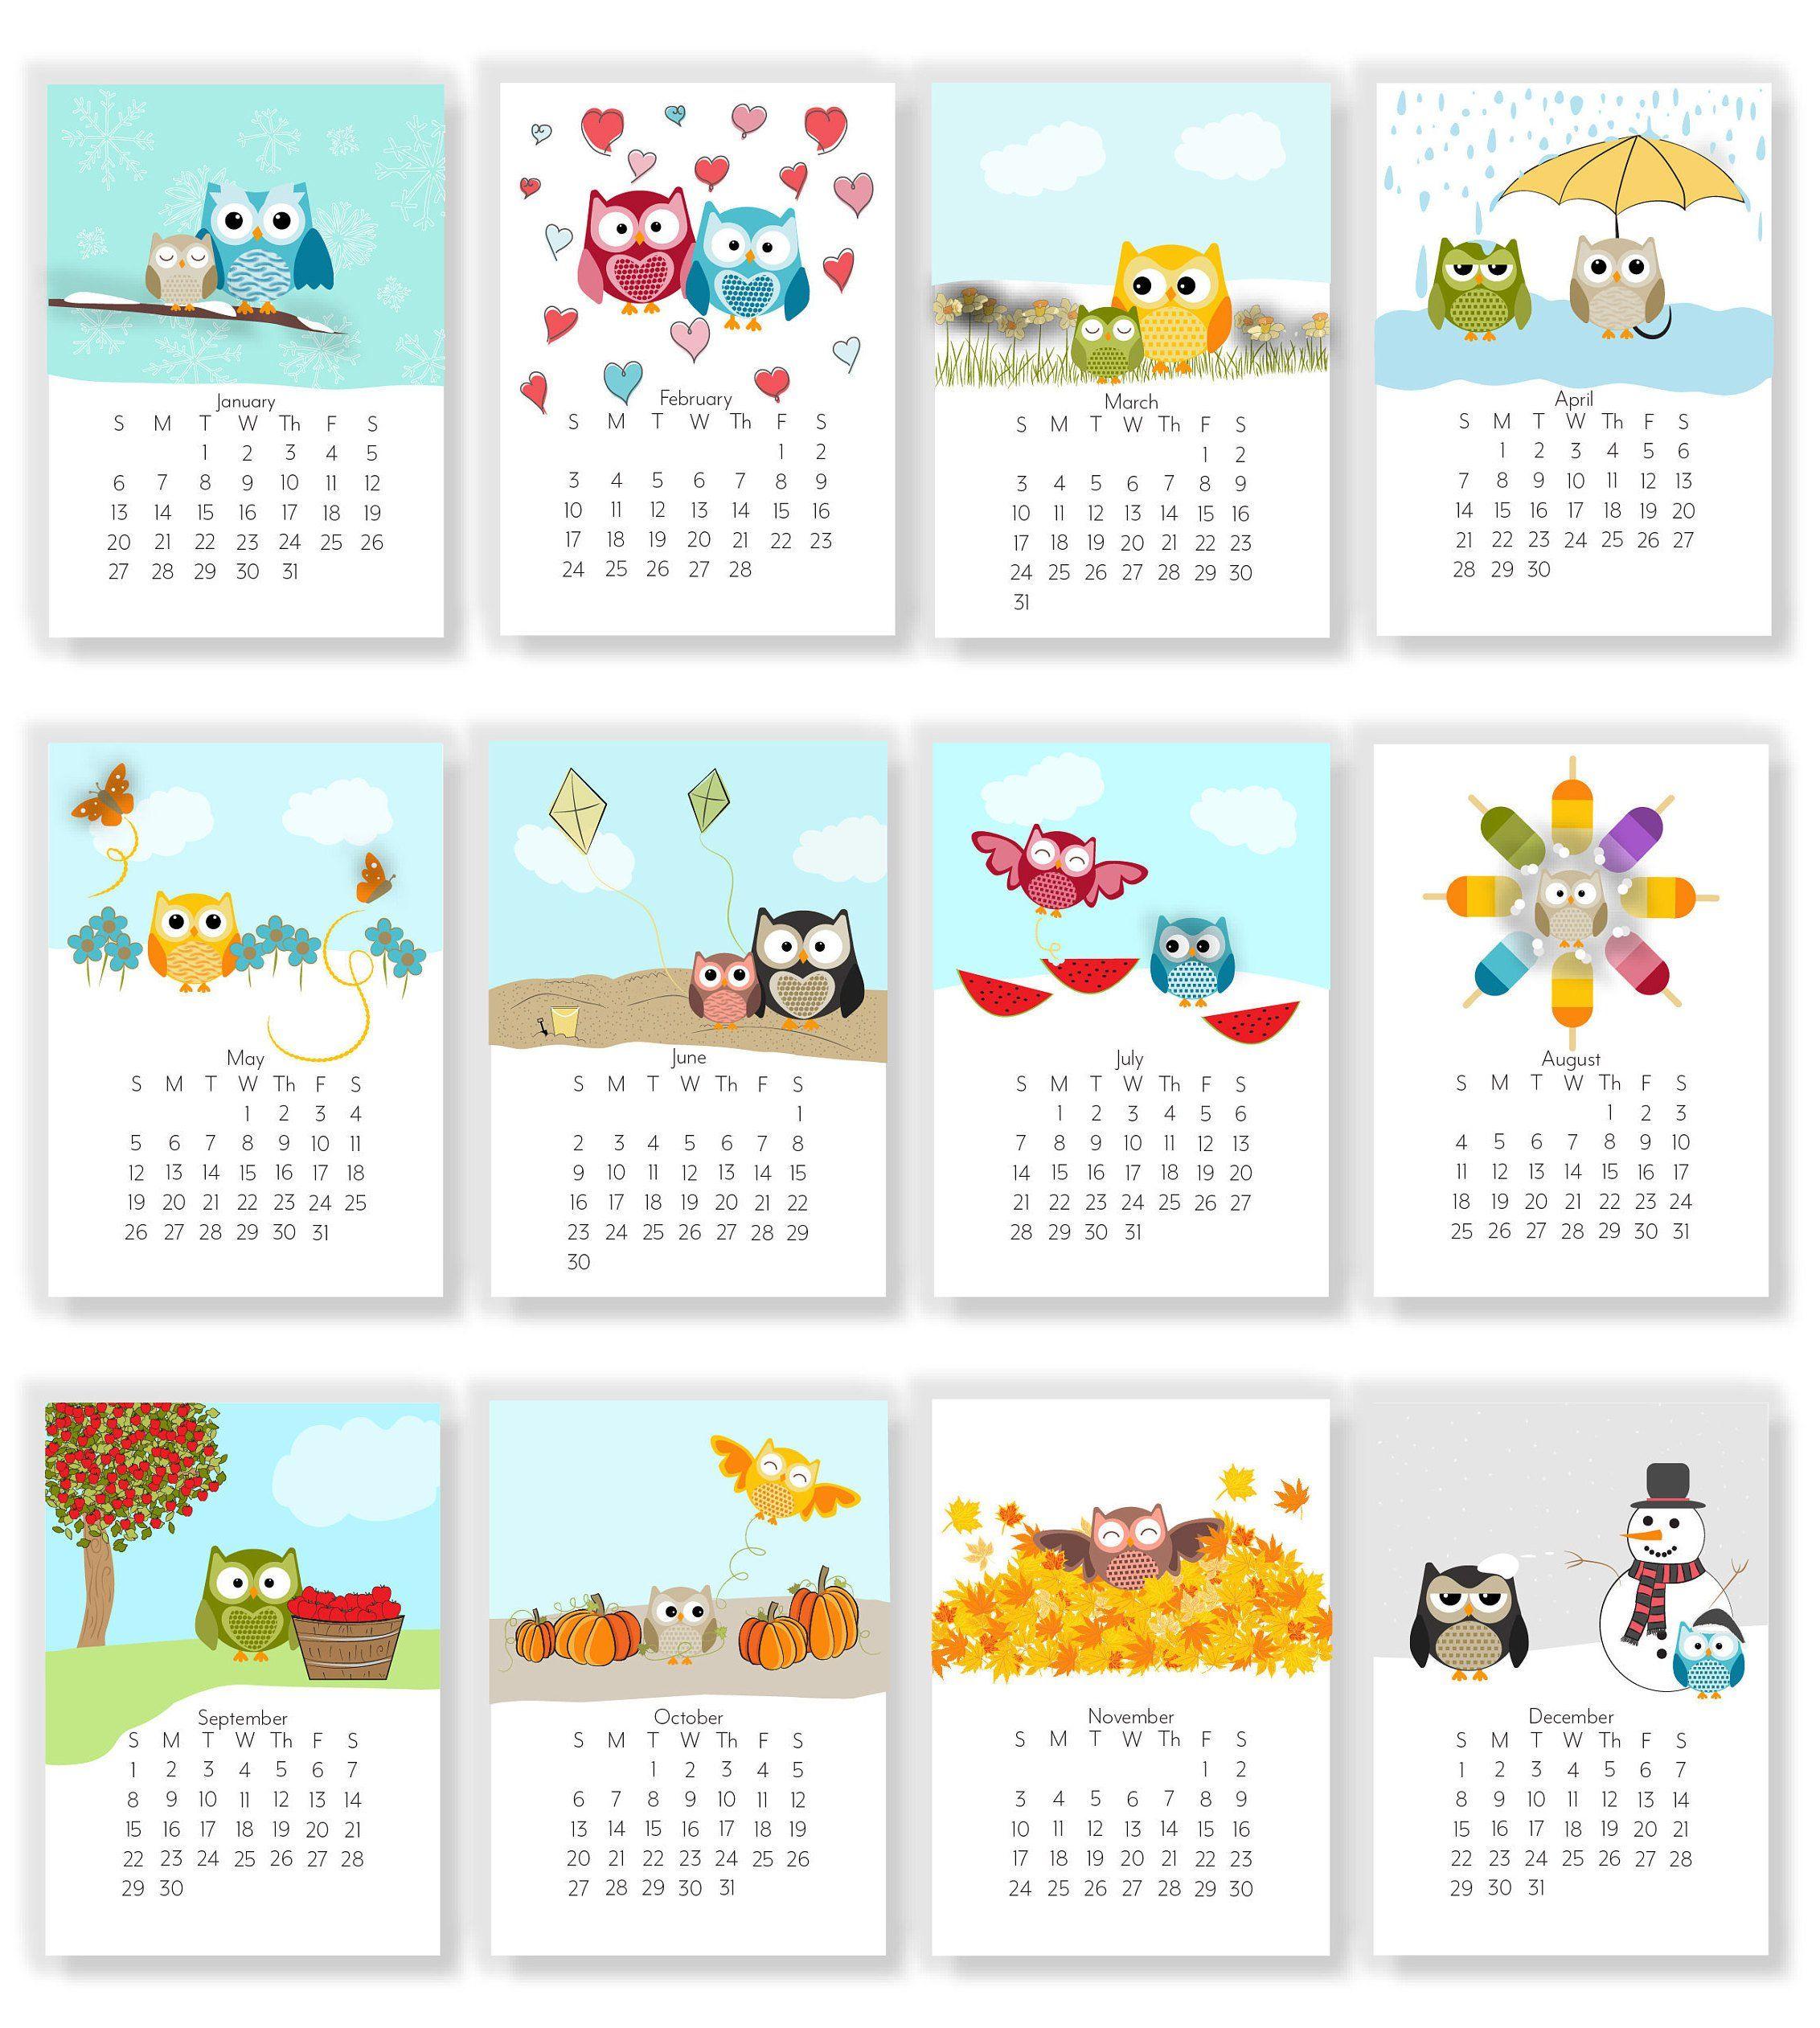 2020 Adorable Owl Monthly Calendars Instant Download Etsy In 2020 Calendar Monthly Planner Instant Download Etsy Calendar